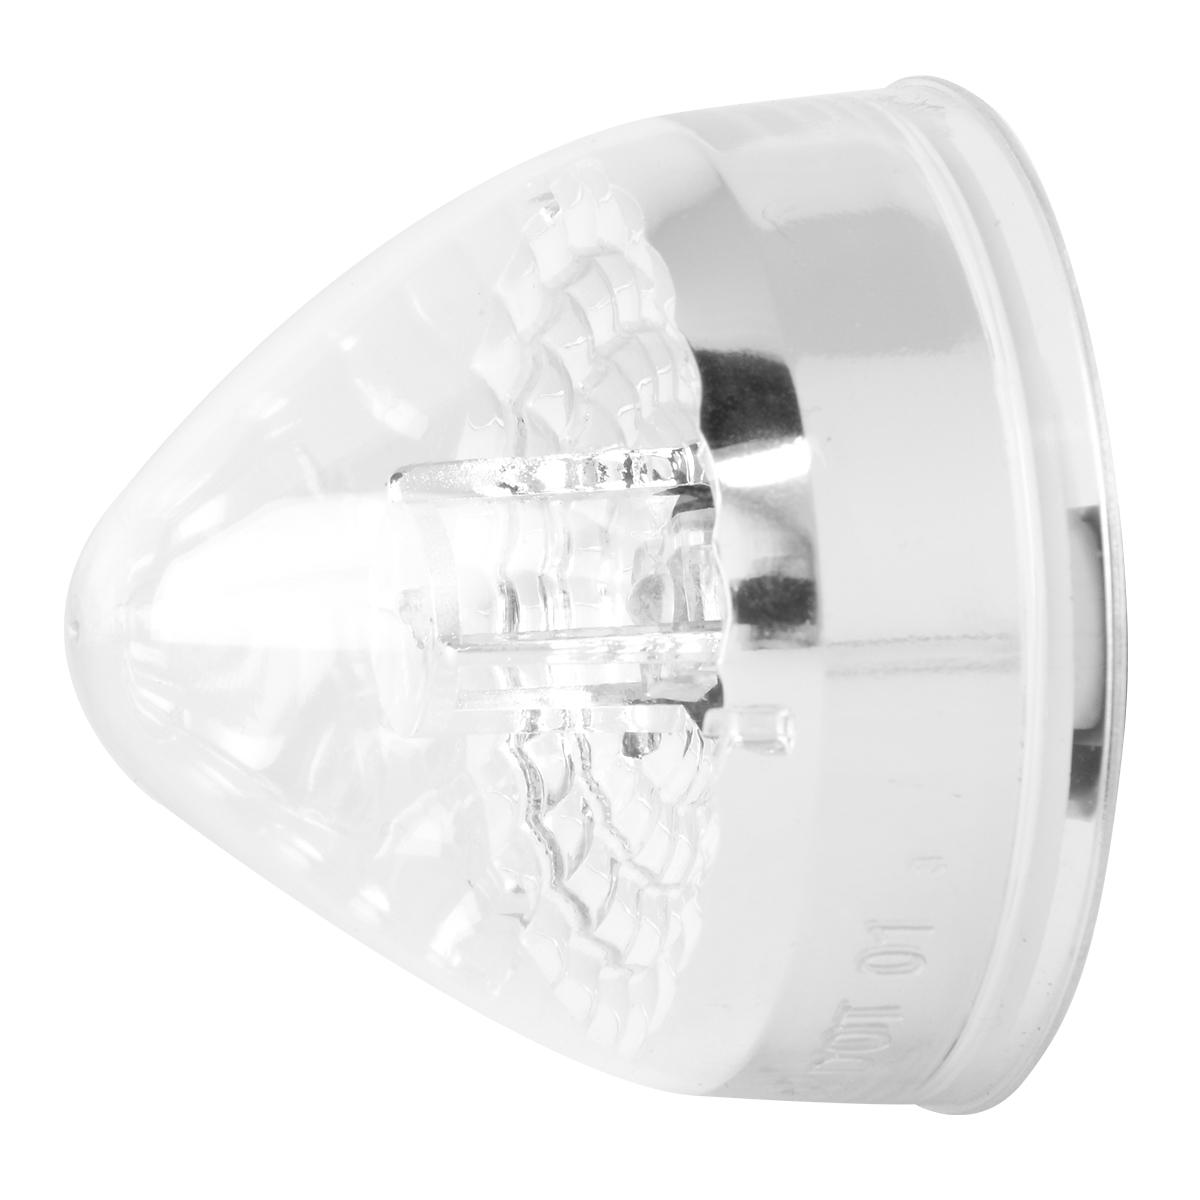 "2"" Beehive Spyder LED Marker Light in Clear Lens"